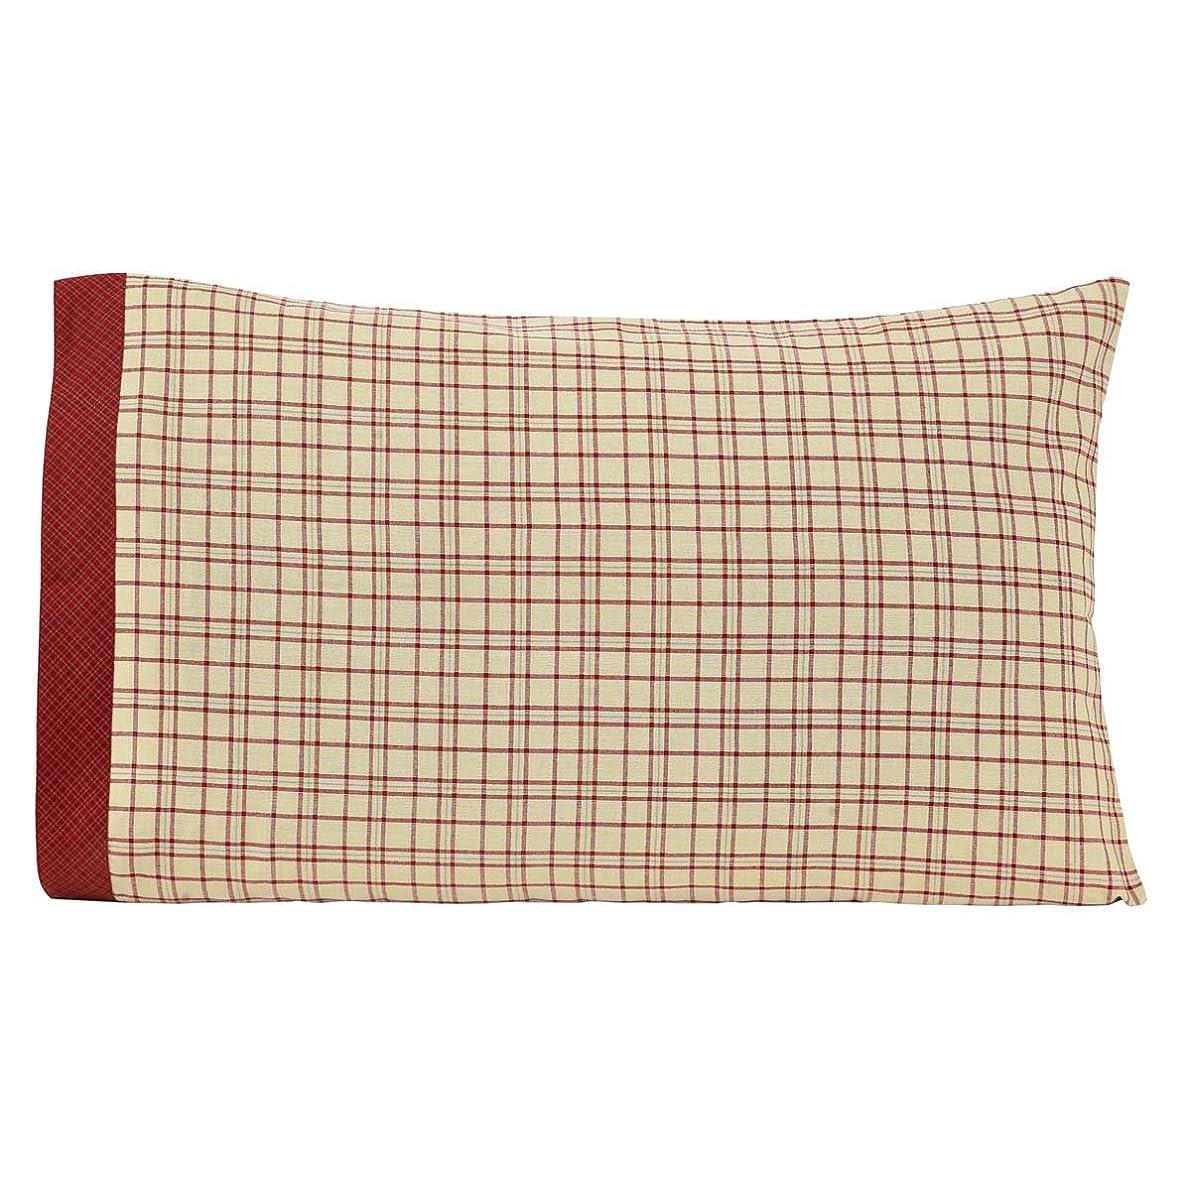 VHC Brands Rustic & Lodge Bedding Durango Cotton Plaid Pillow Case Set of 2, Standard, Creme White